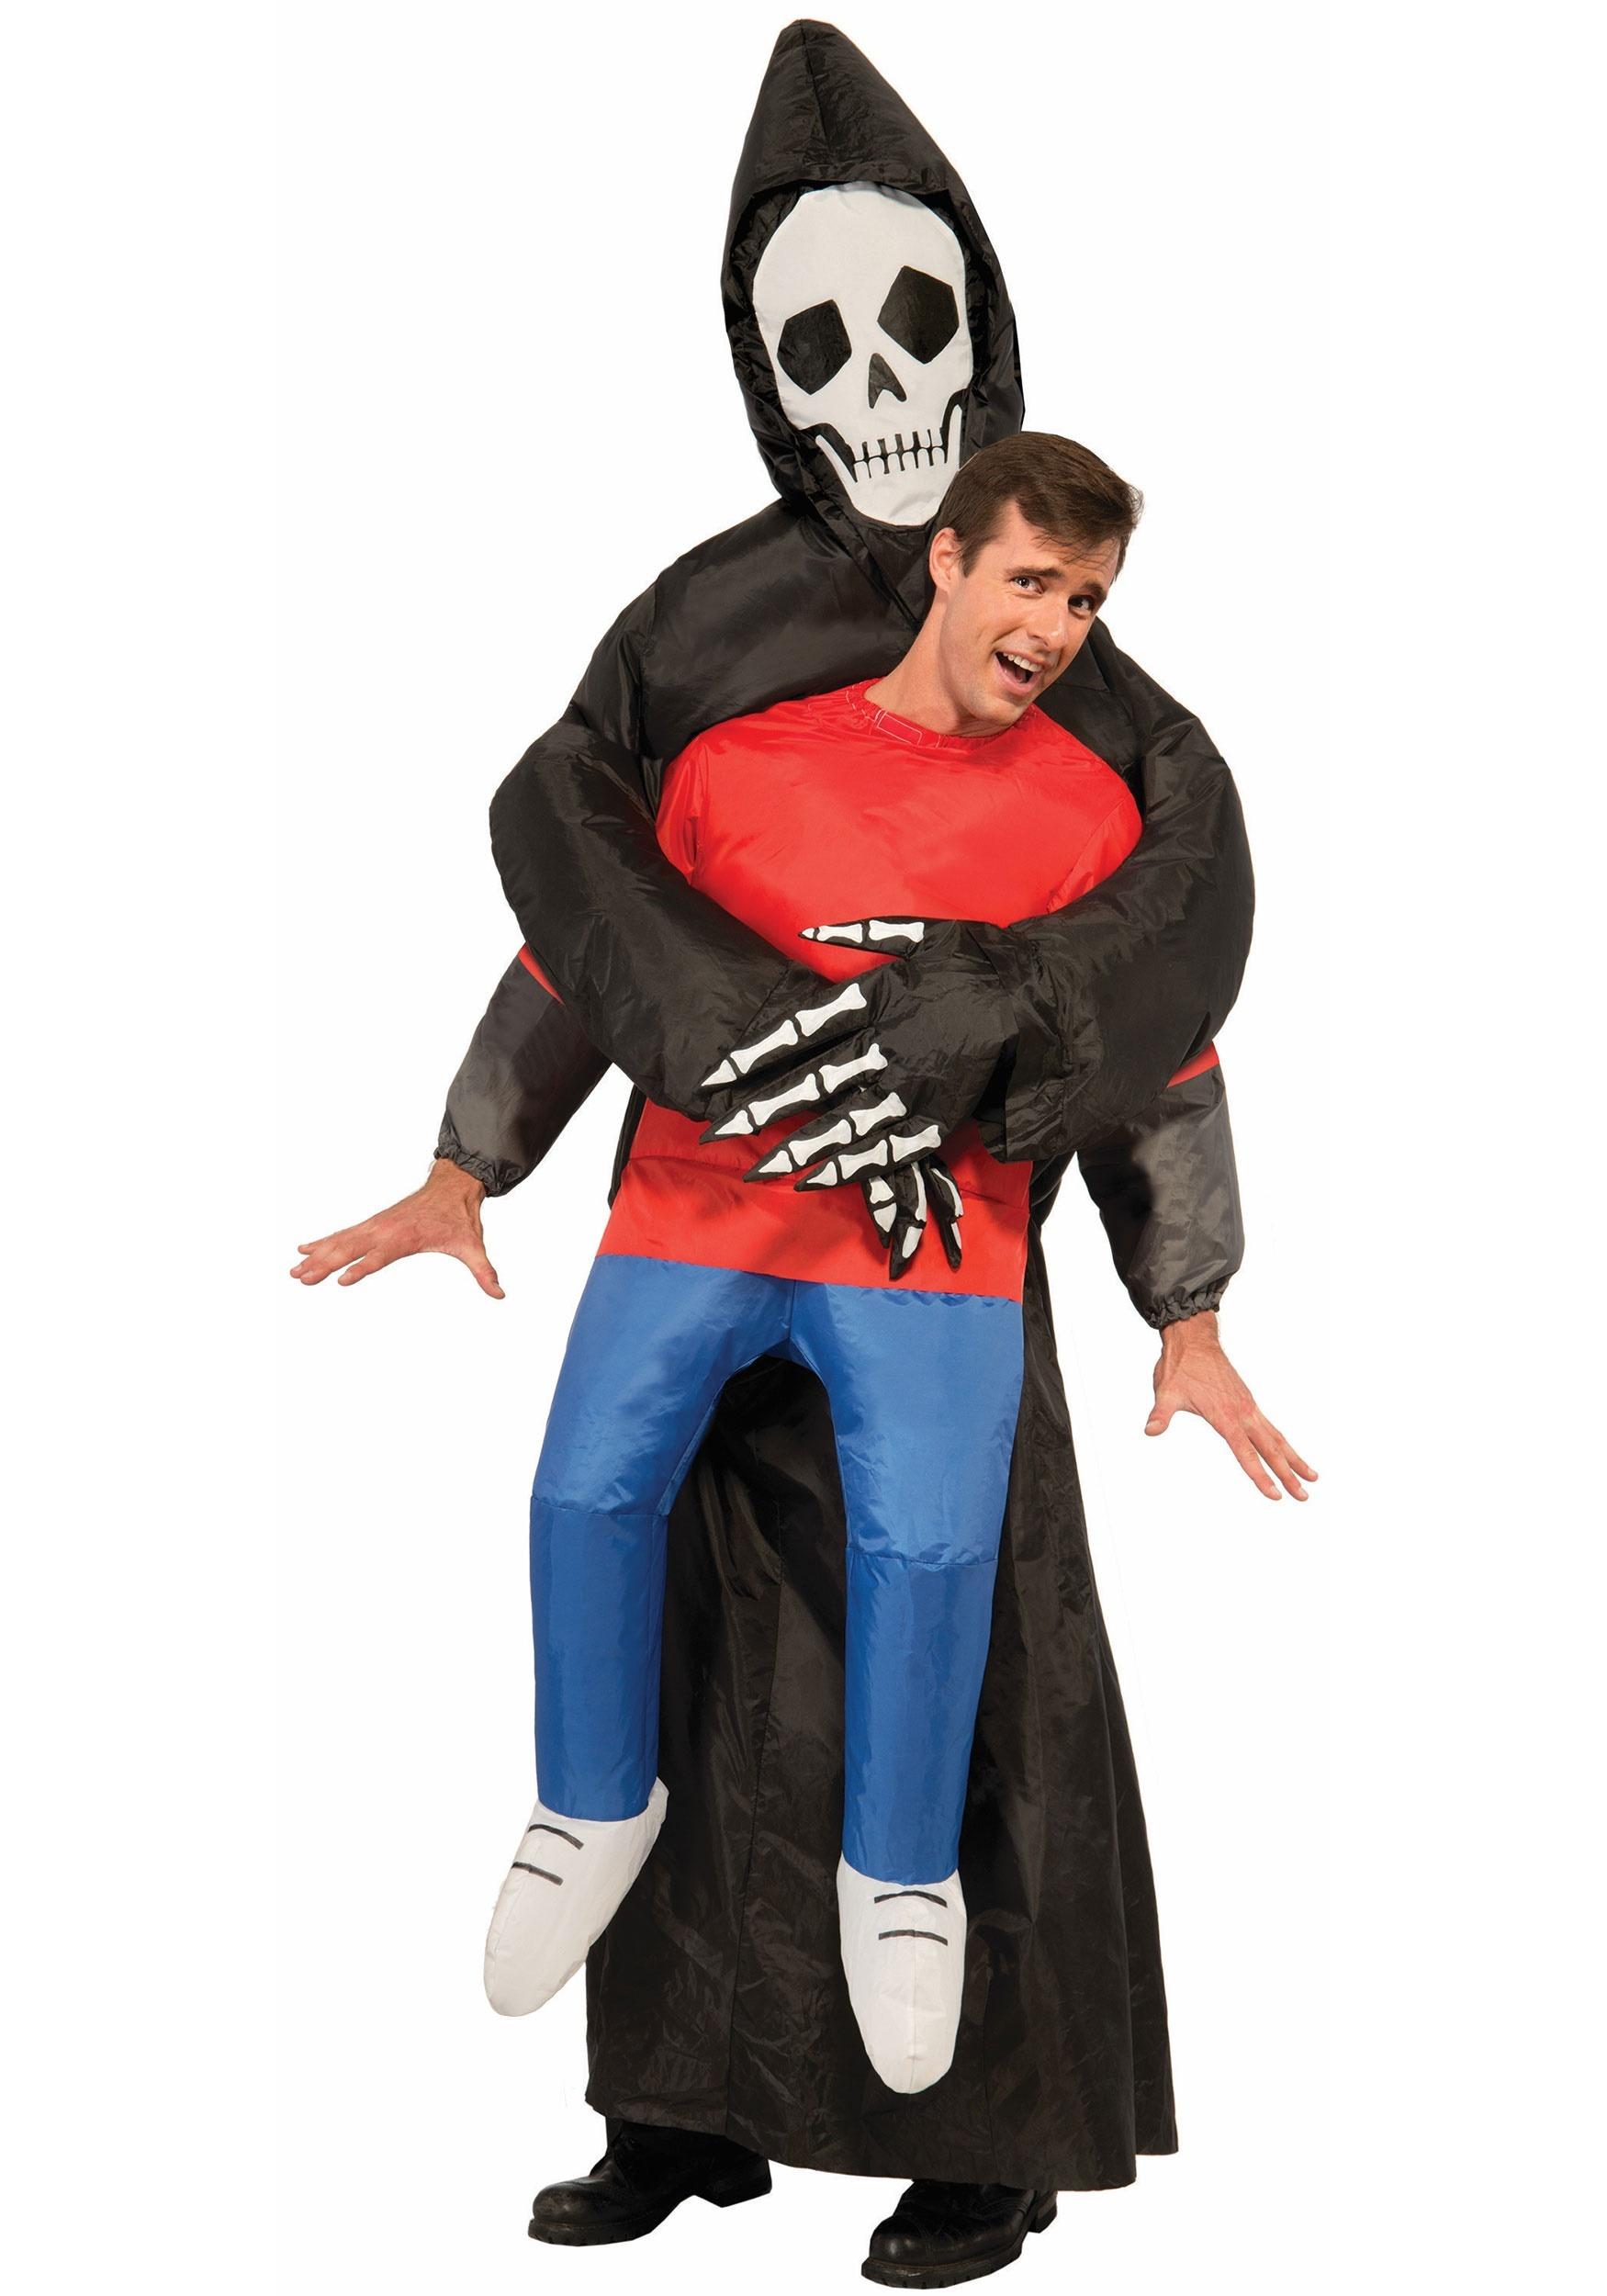 Inflatable Reaper Adult Costume  sc 1 st  Halloween Costumes & Grim Reaper Costumes for Adults u0026 Kids - HalloweenCostumes.com